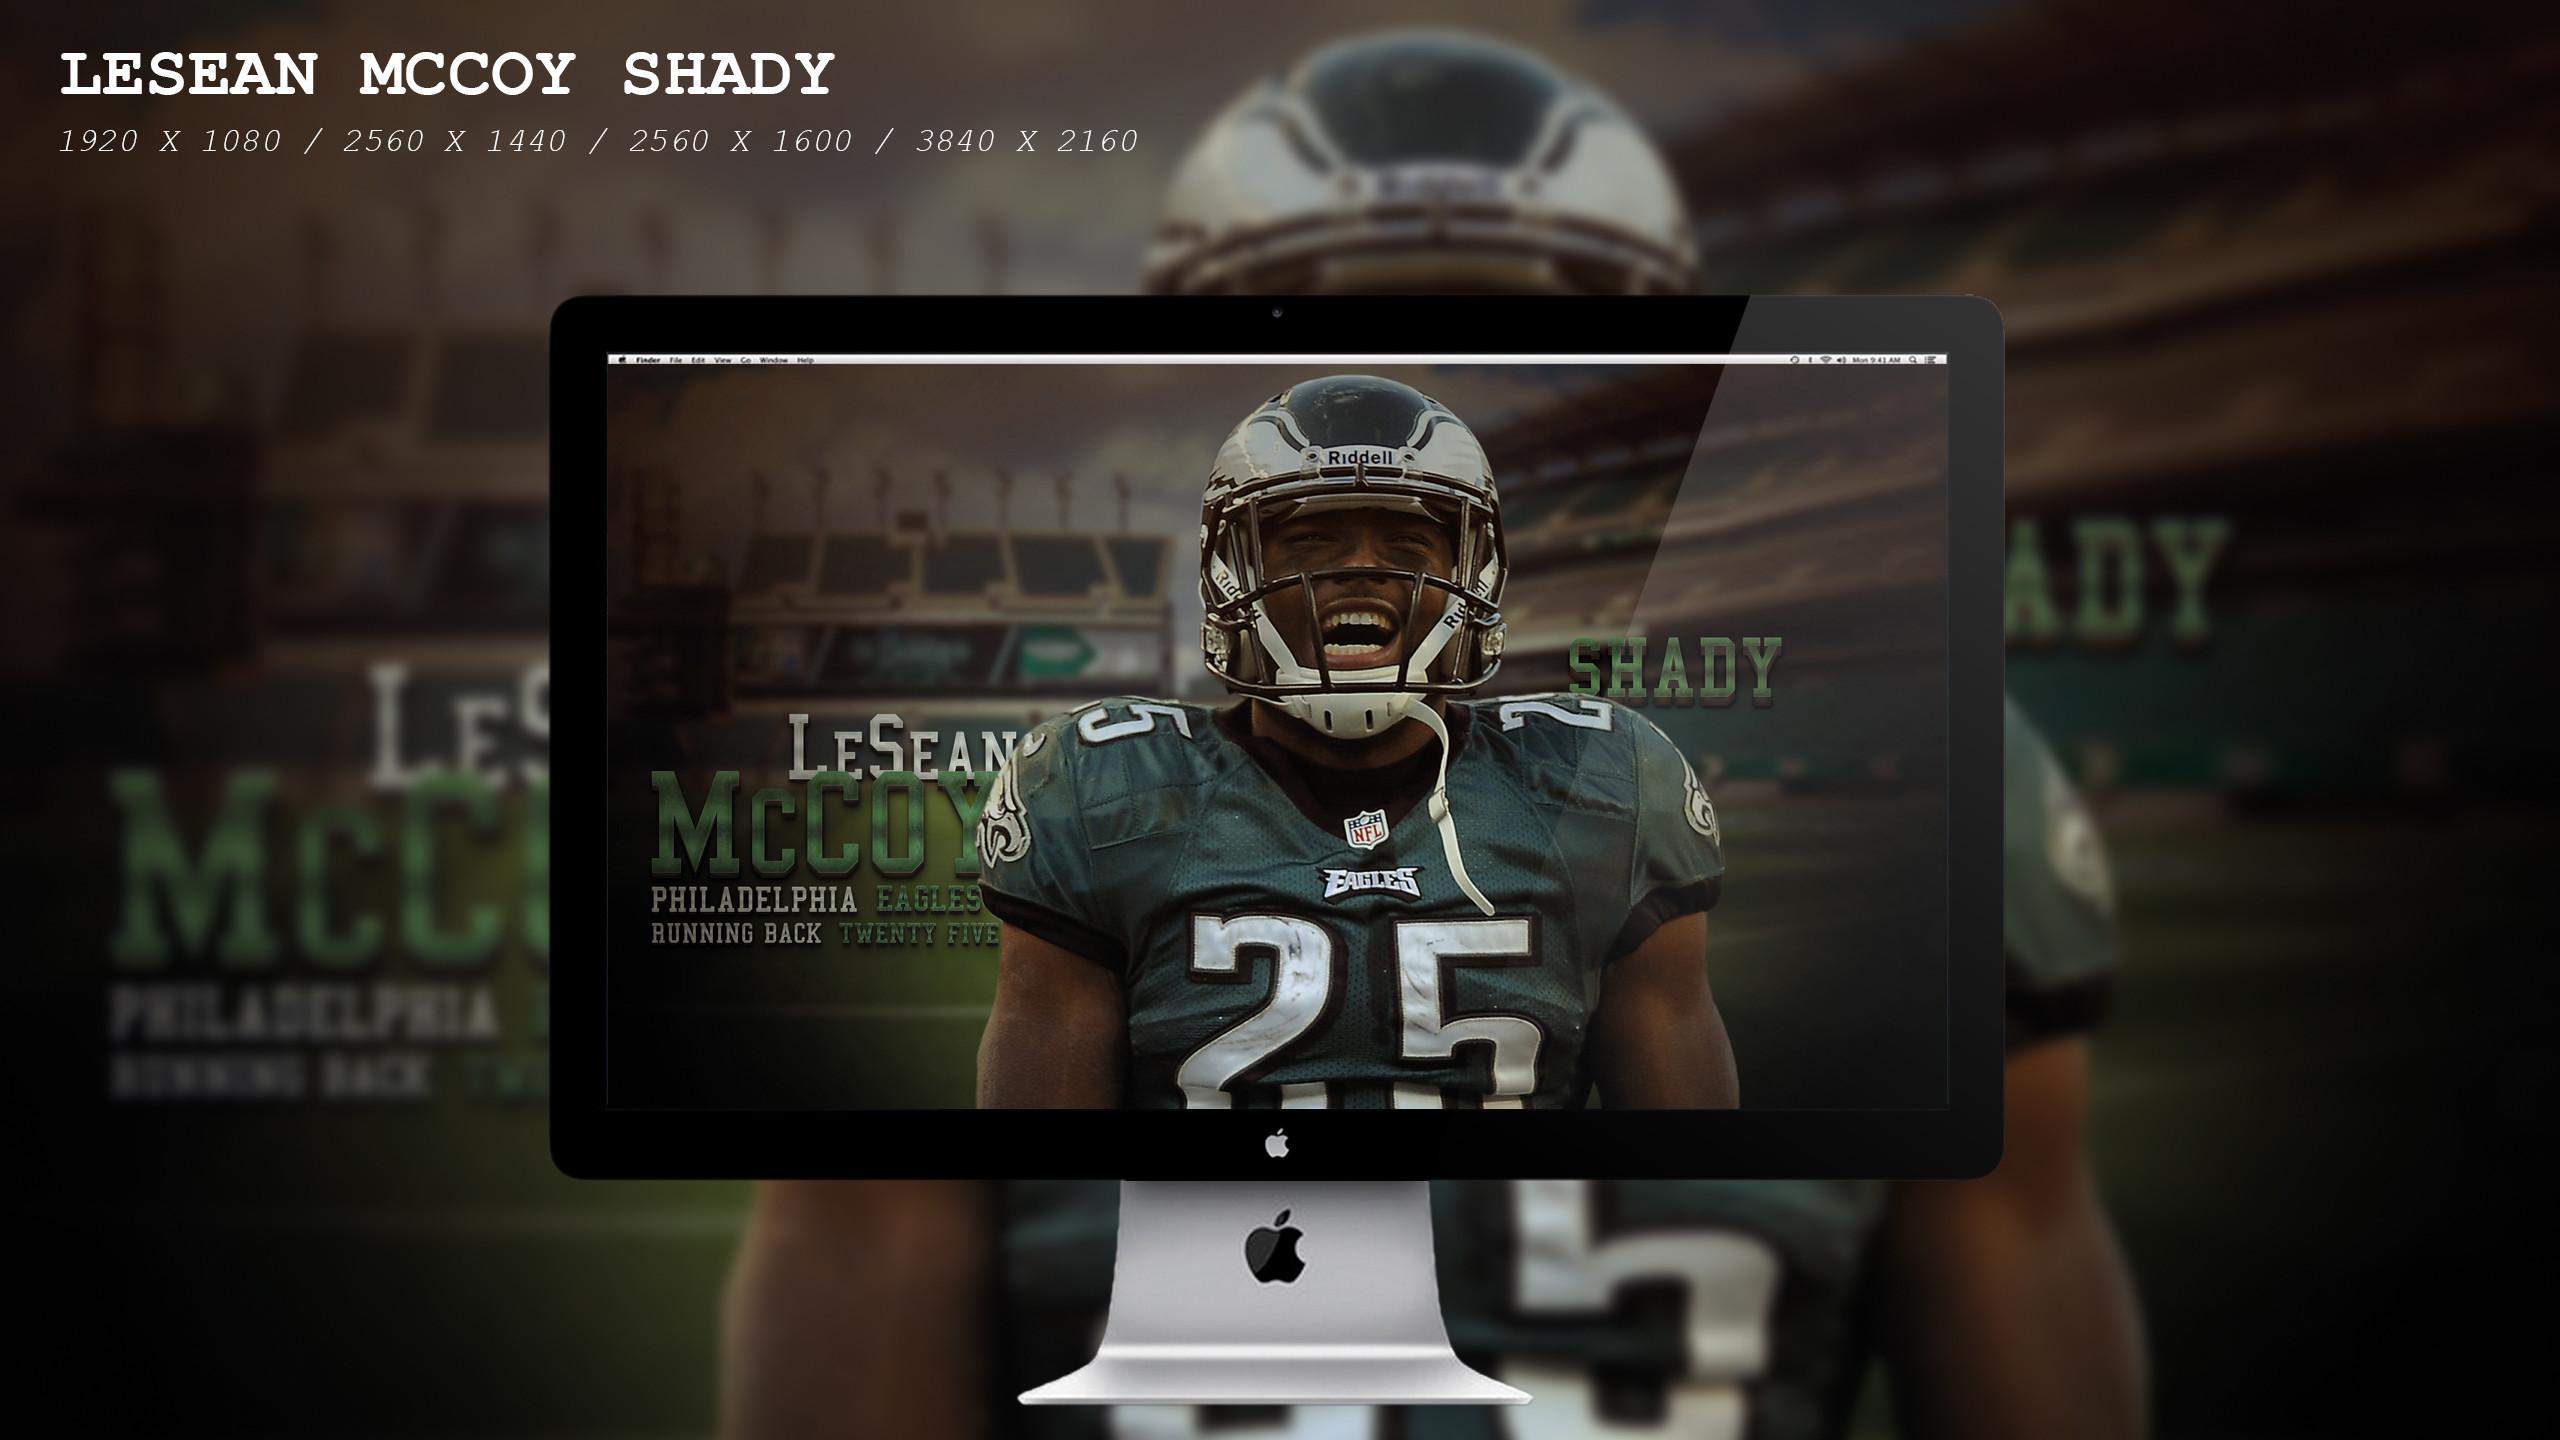 LeSean McCoy Shady Wallpaper HD by BeAware8 on DeviantArt